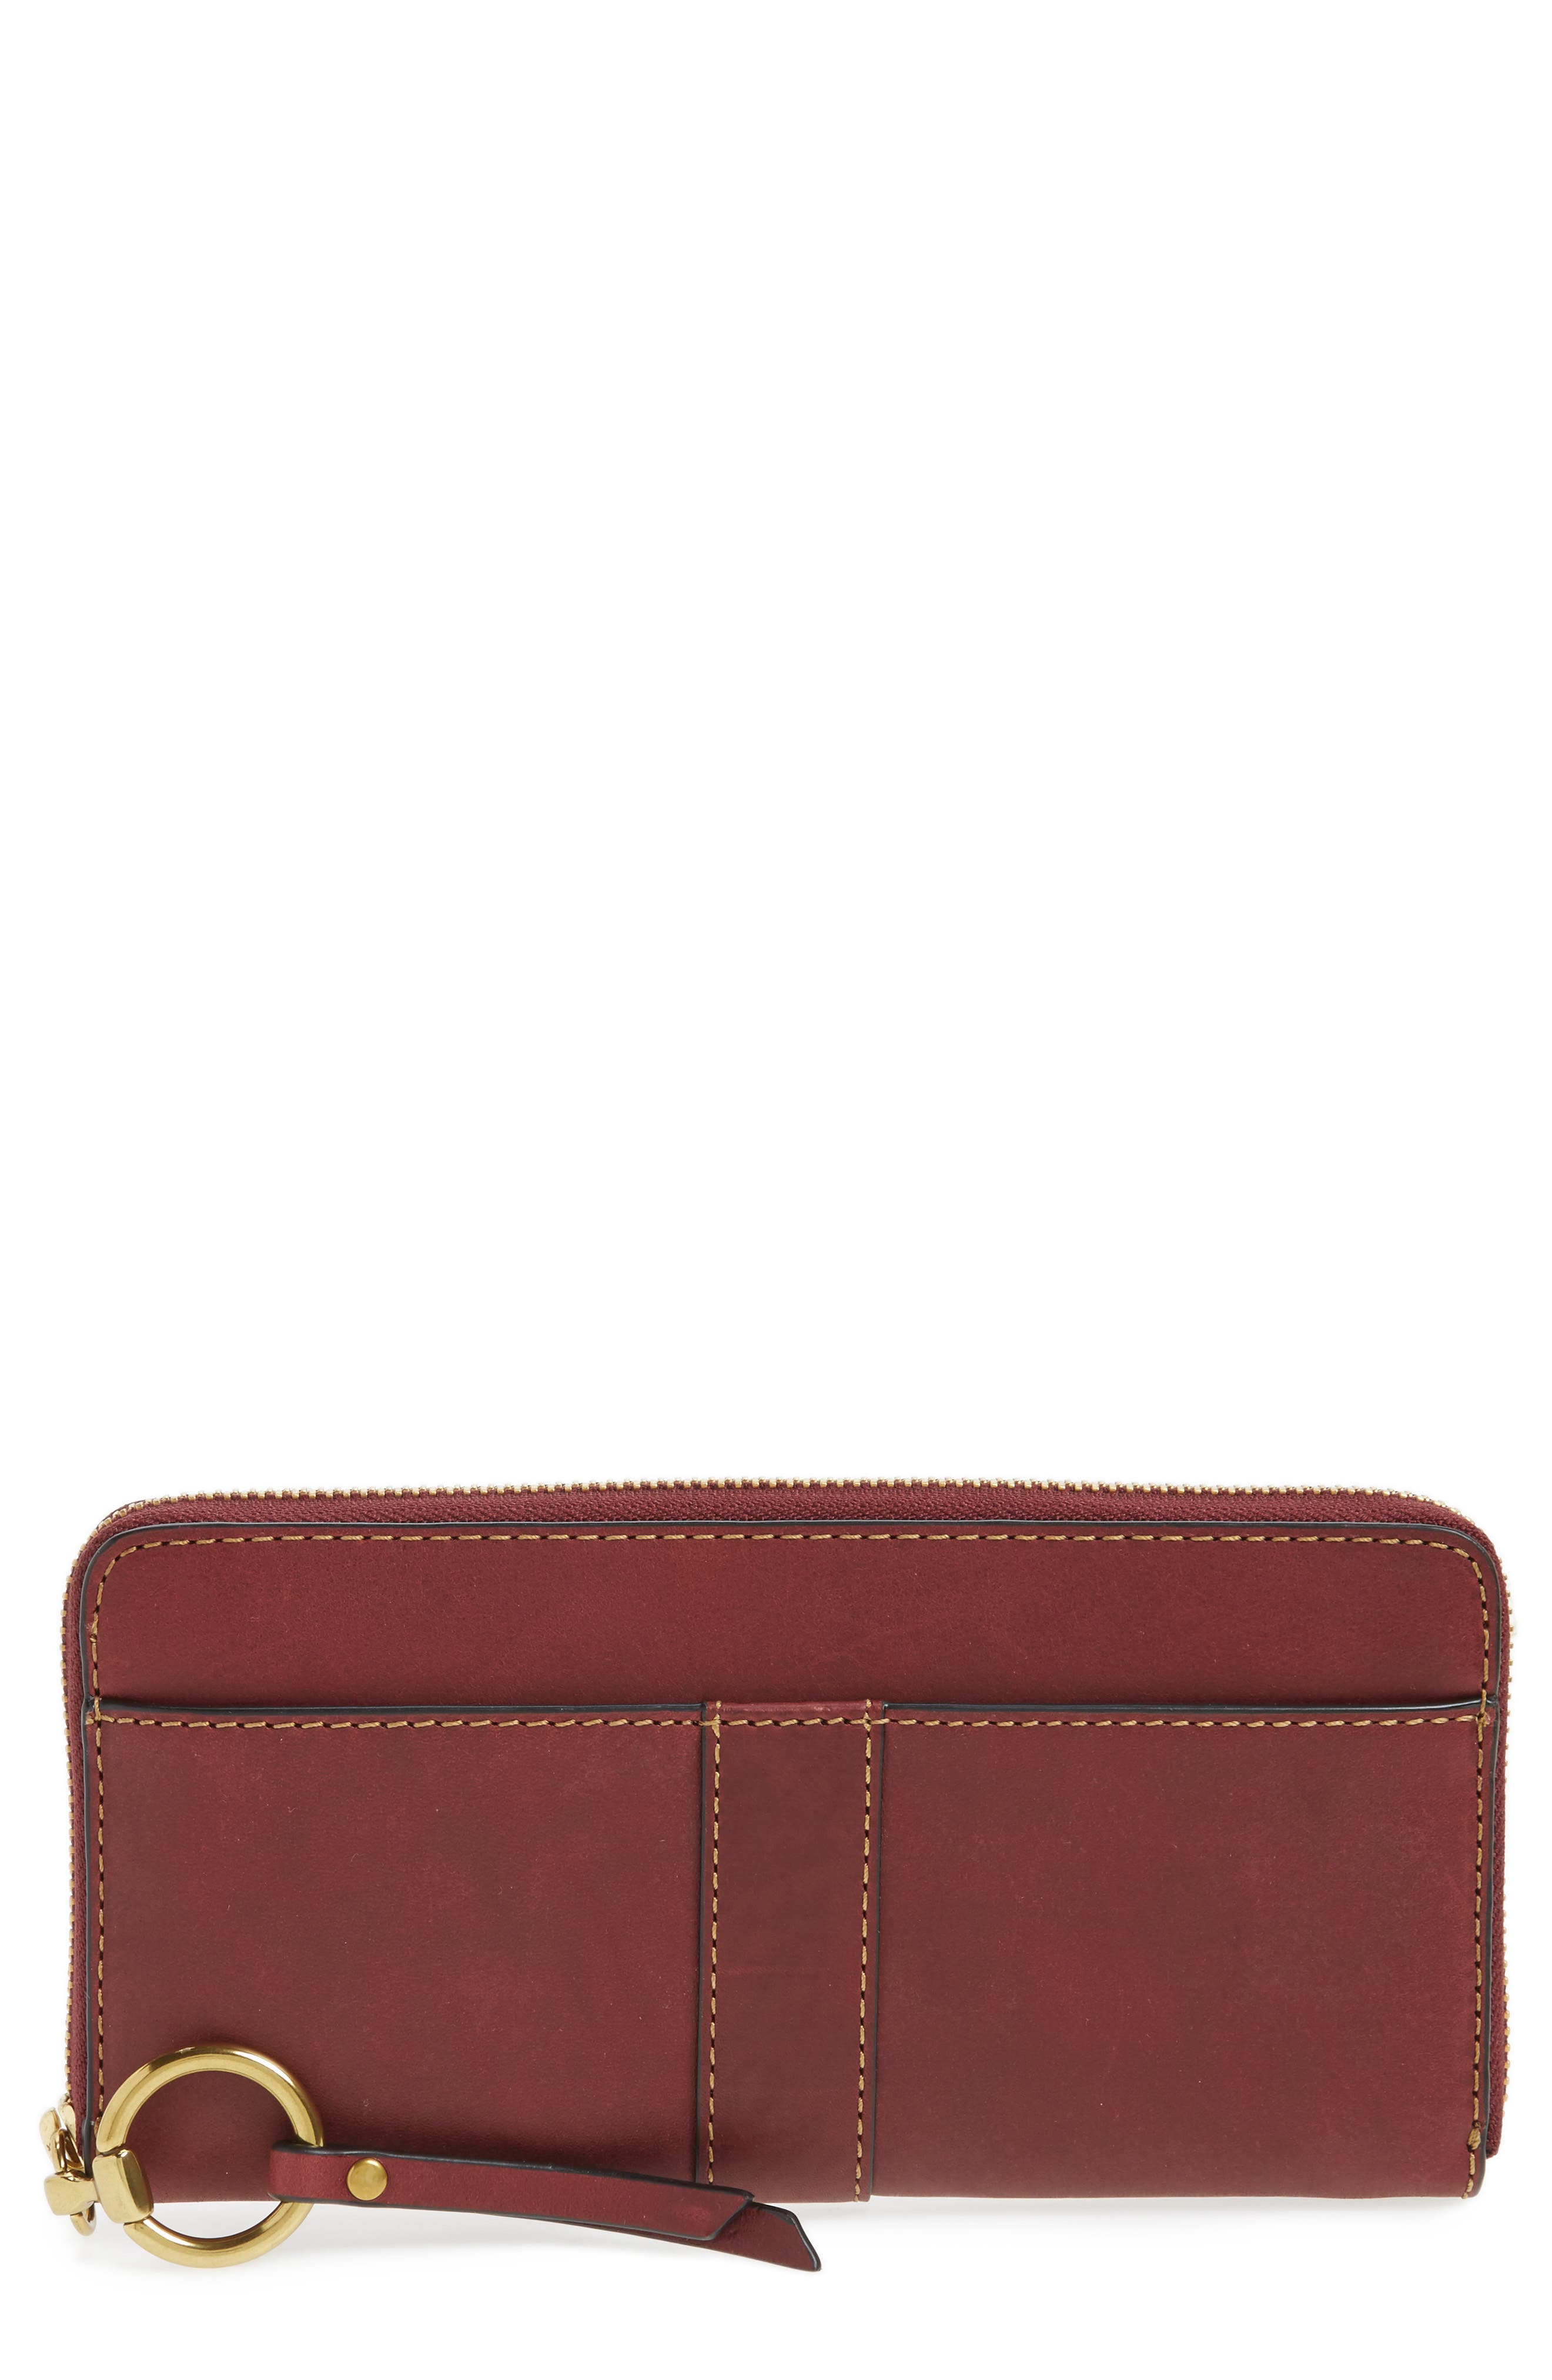 Ilana Harness Leather Zip Wallet,                             Main thumbnail 2, color,